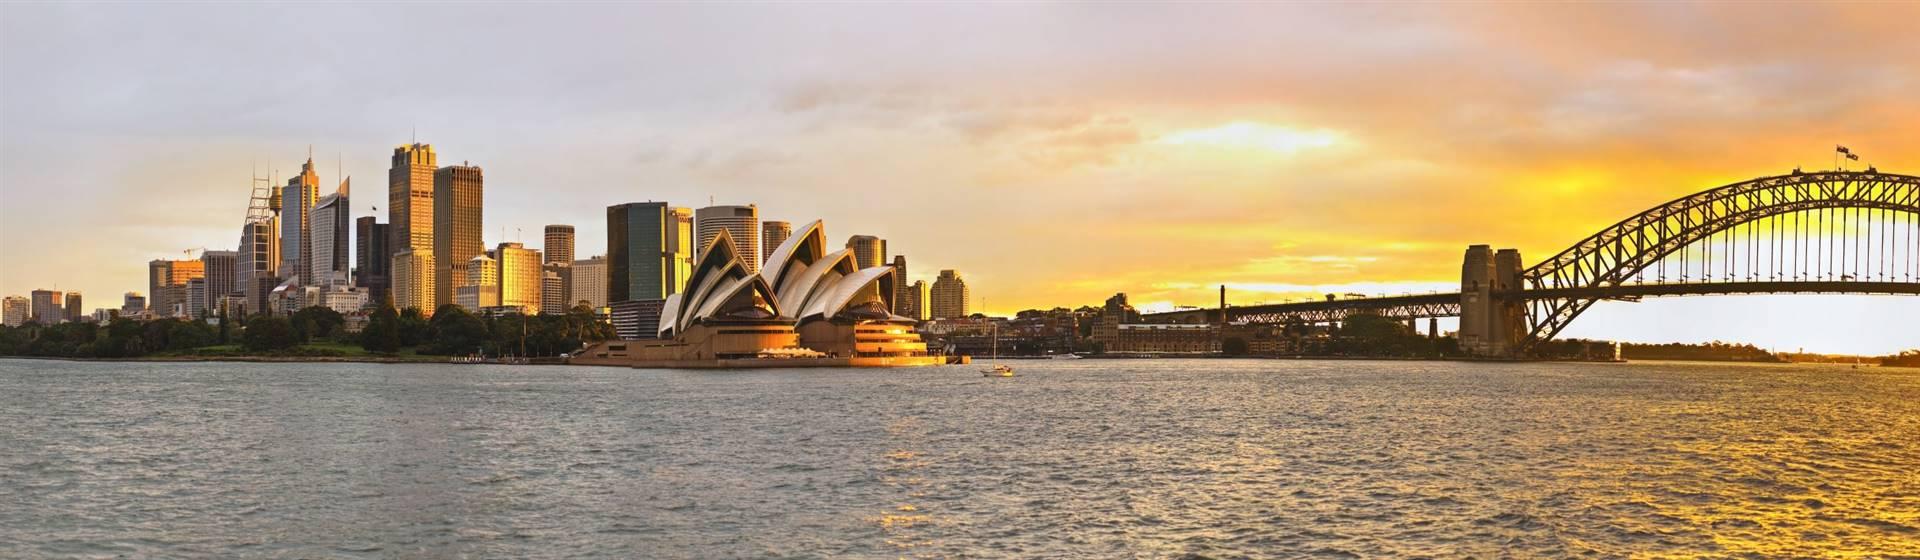 "<img src=""sydney-shutterstock.jpeg"" alt=""Australiia""/>"